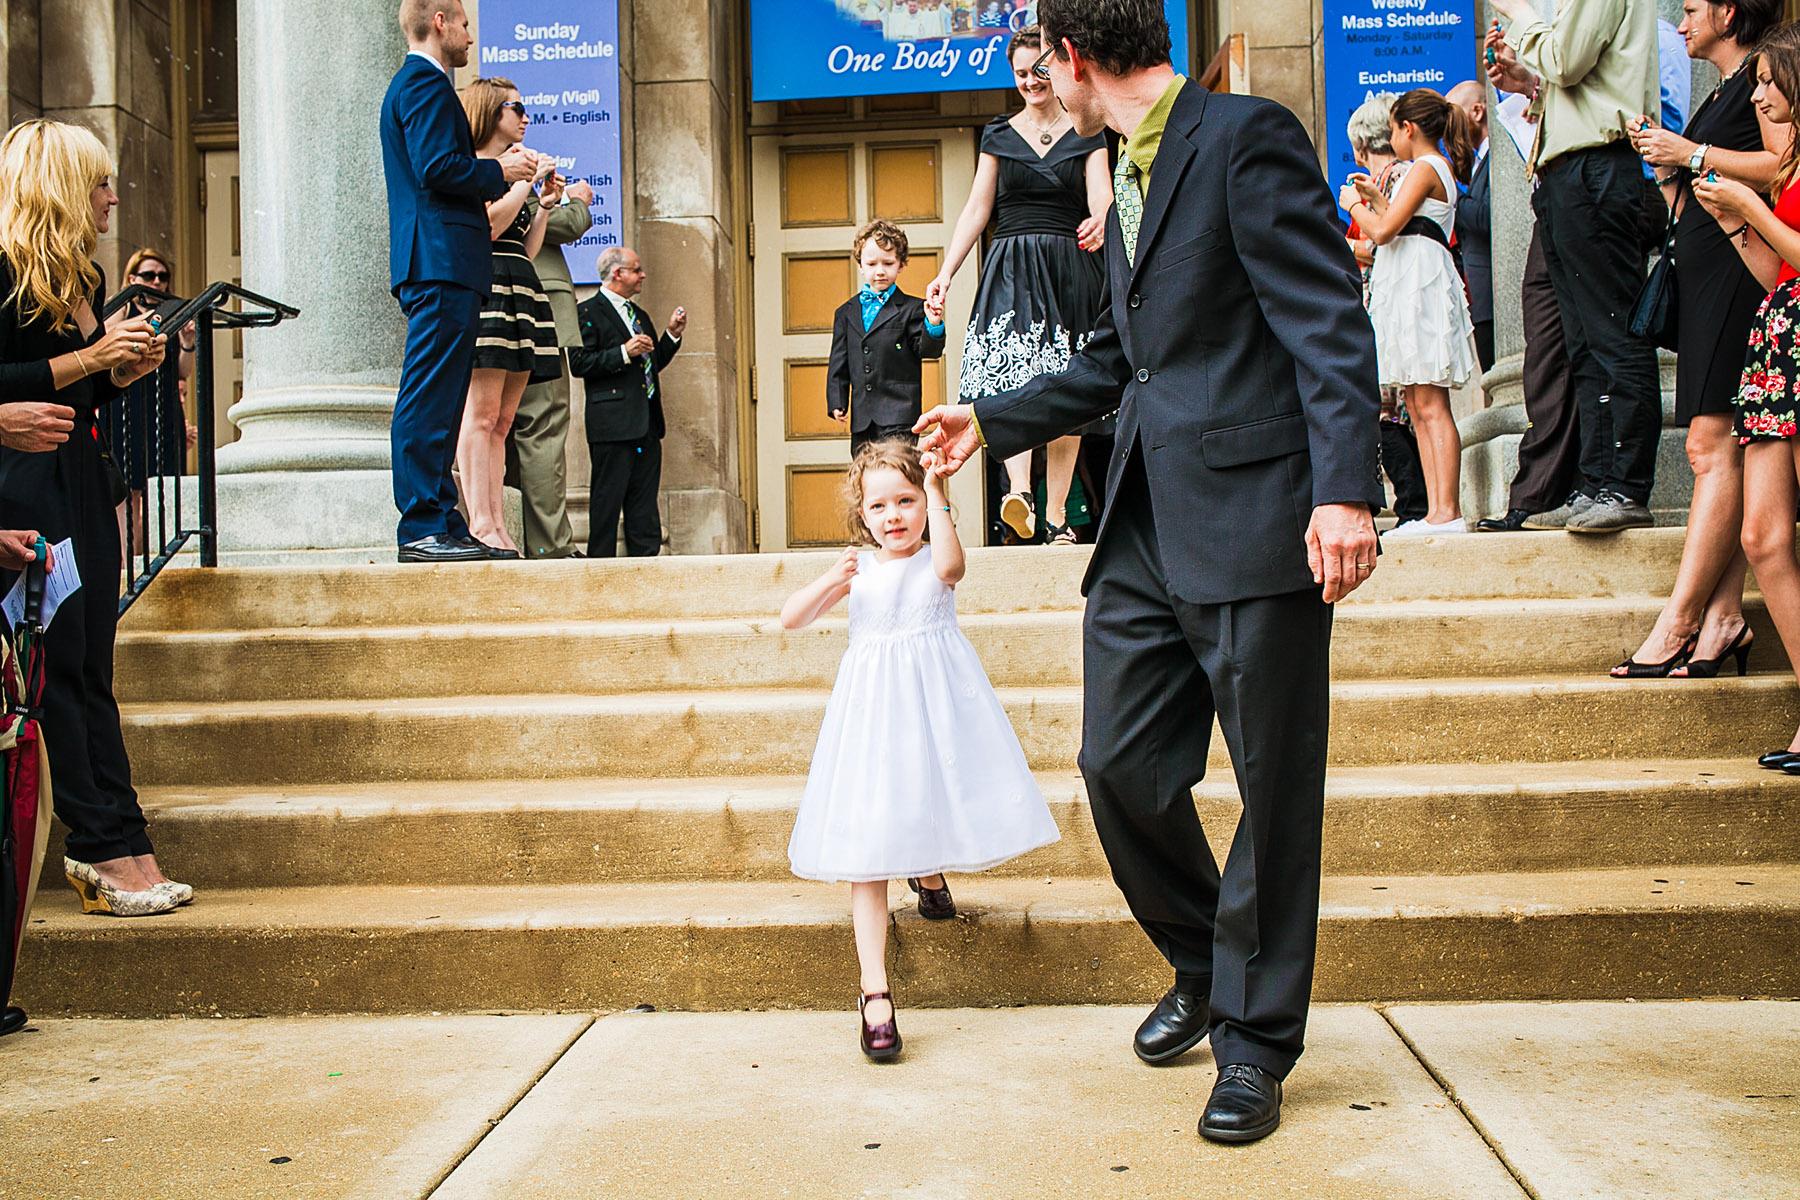 st-hegwig-chicago-urban-arts-society-terrarium-inspired-wedding-documentary-wedding-photography-oriana-koren-22.jpg